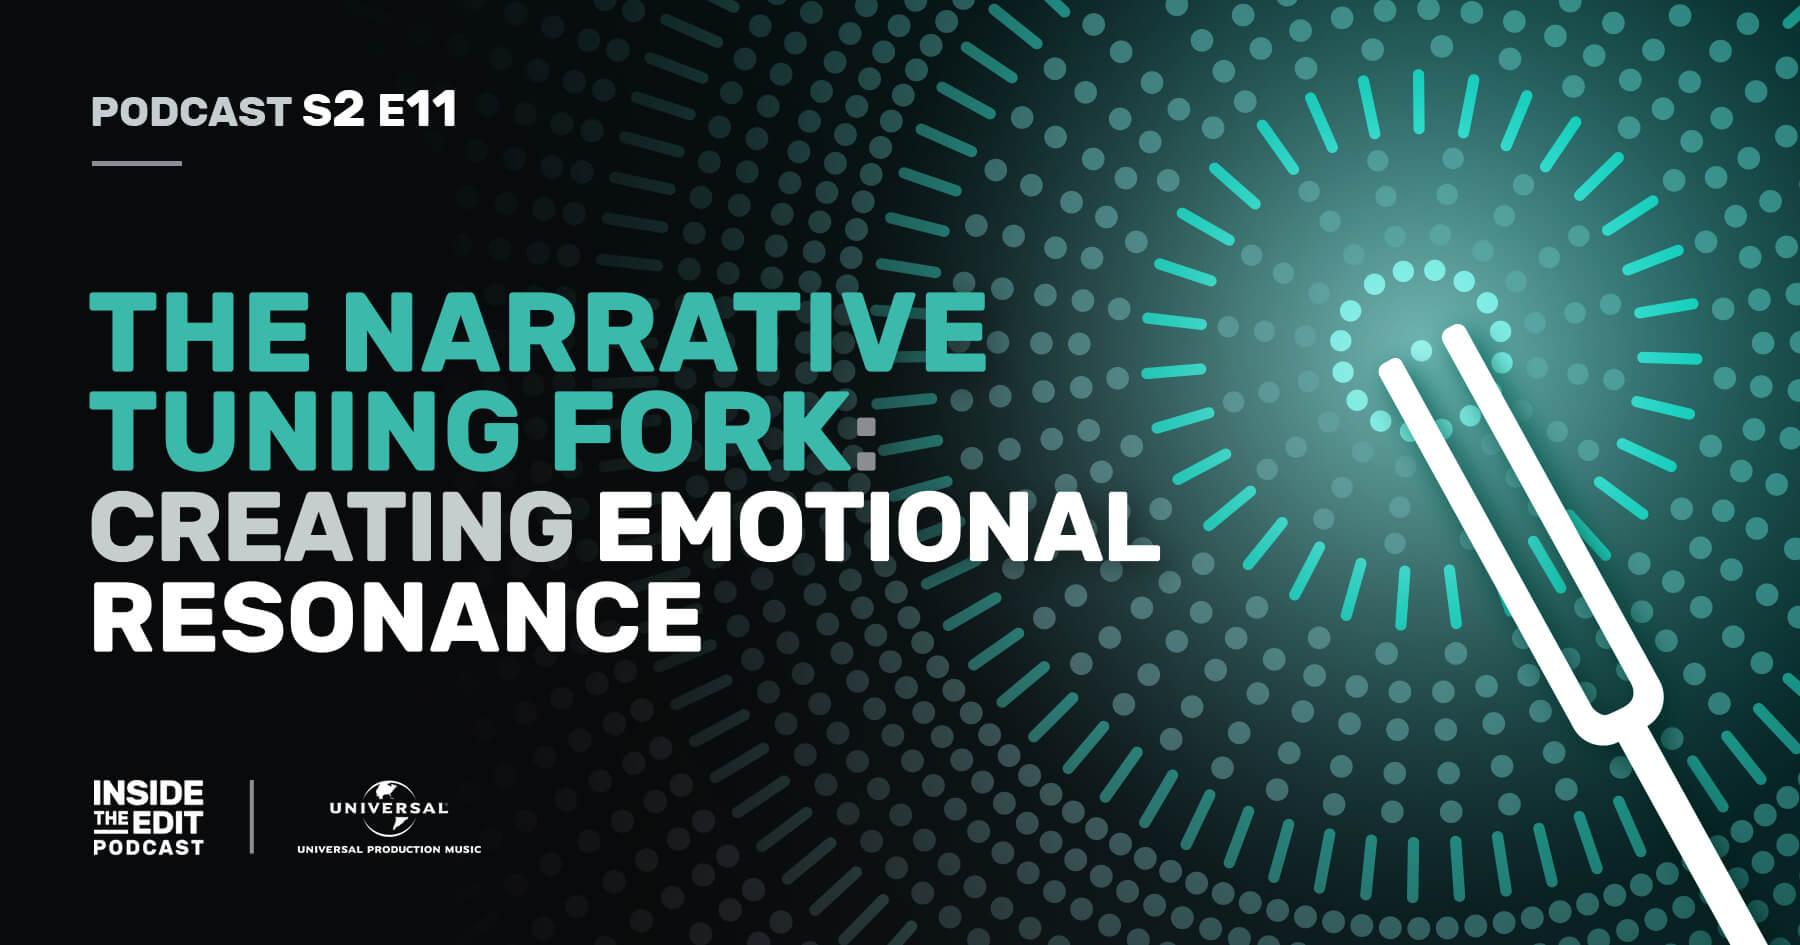 The Narrative Tuning Fork: Creating Emotional Resonance